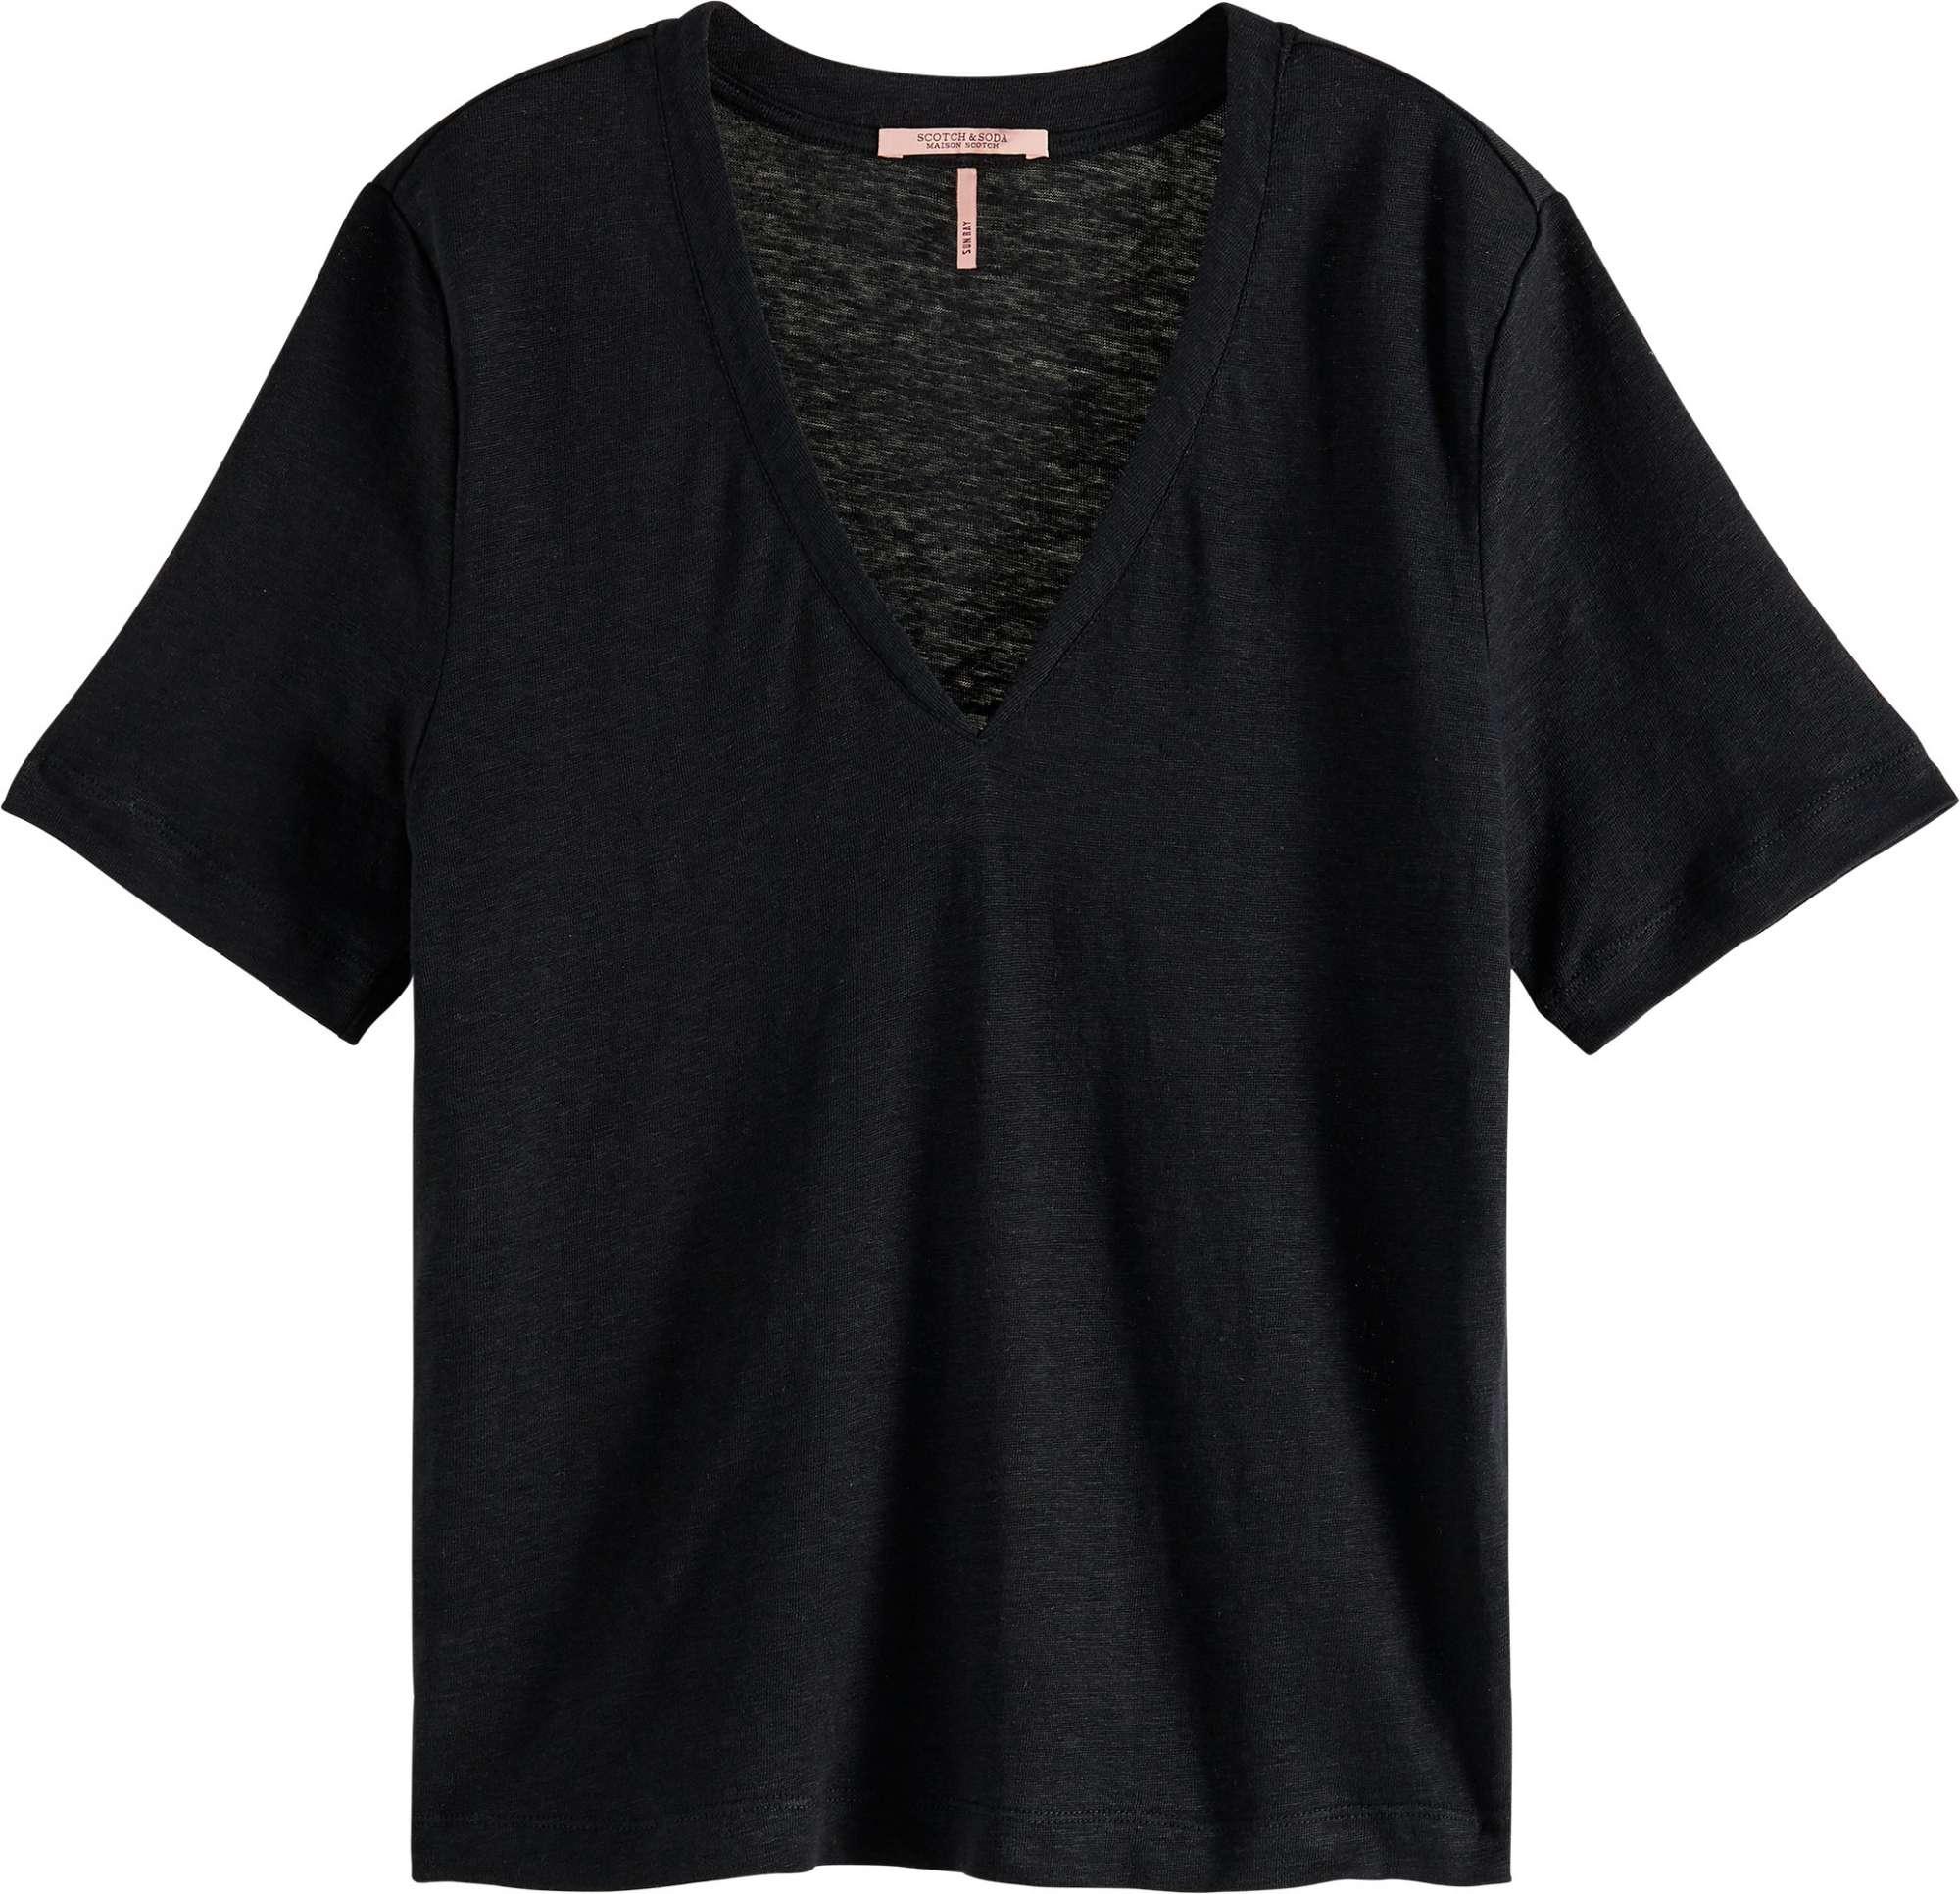 Classic linen tee with v-neckline black